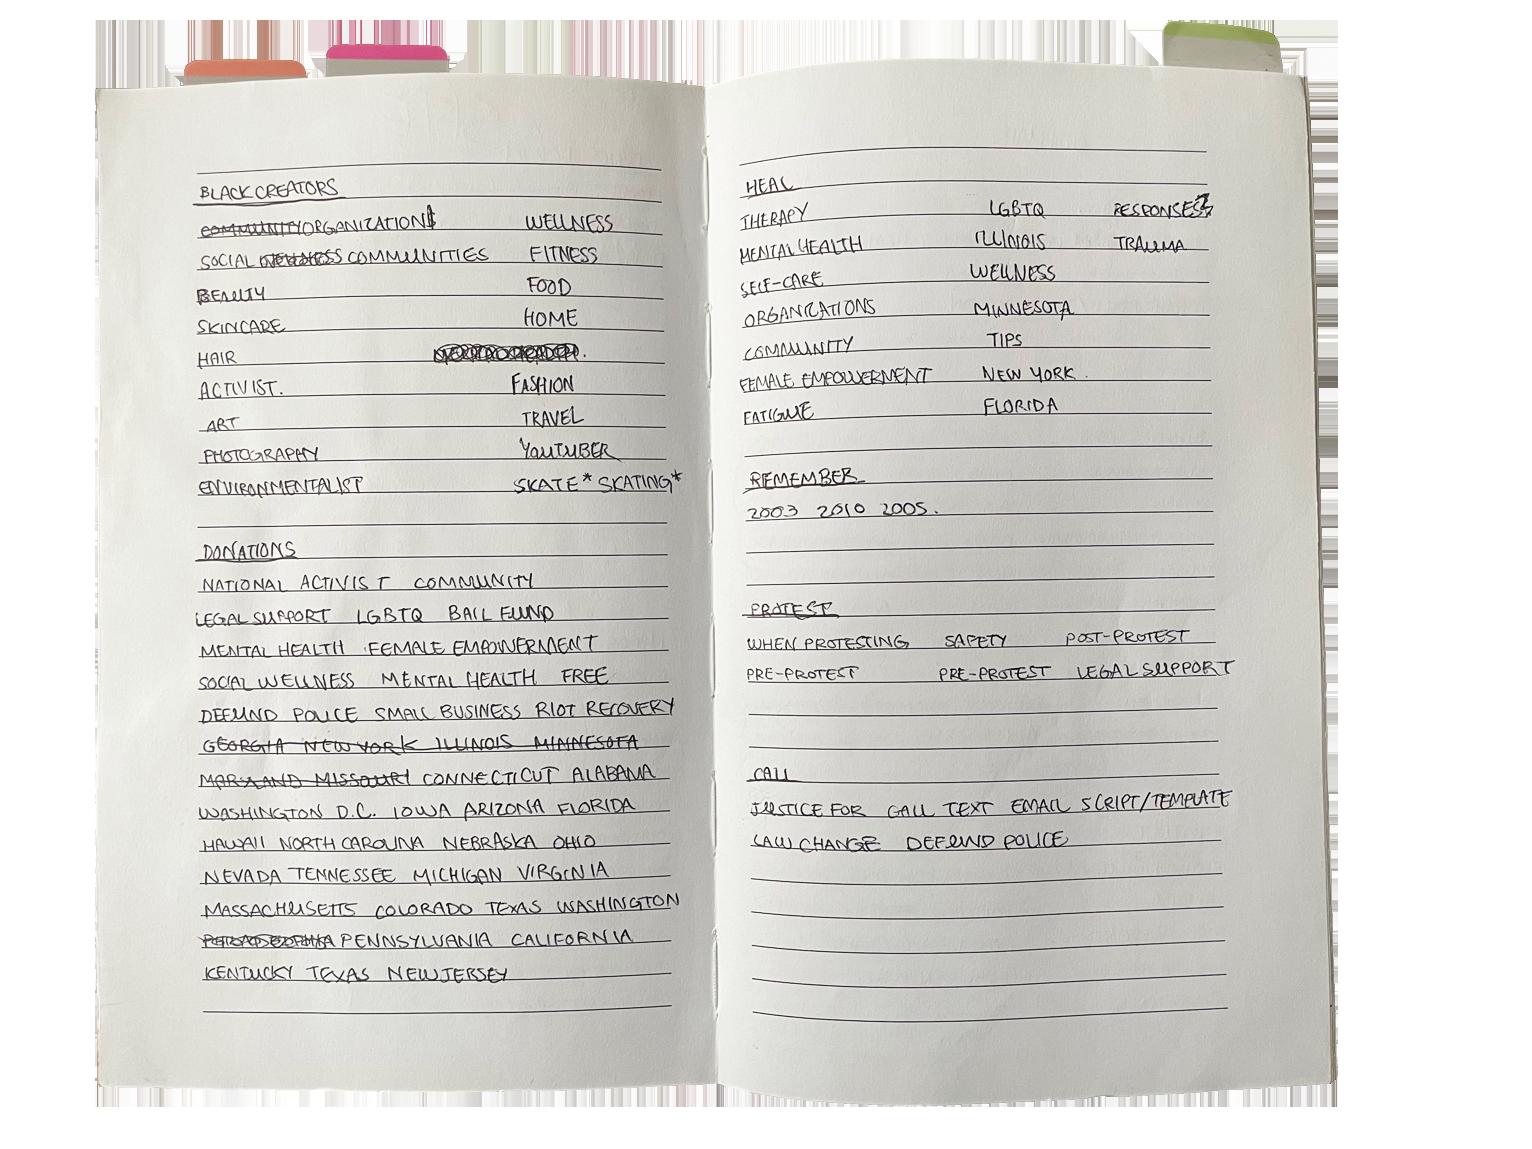 Sketches in journal categorizing social media post topics